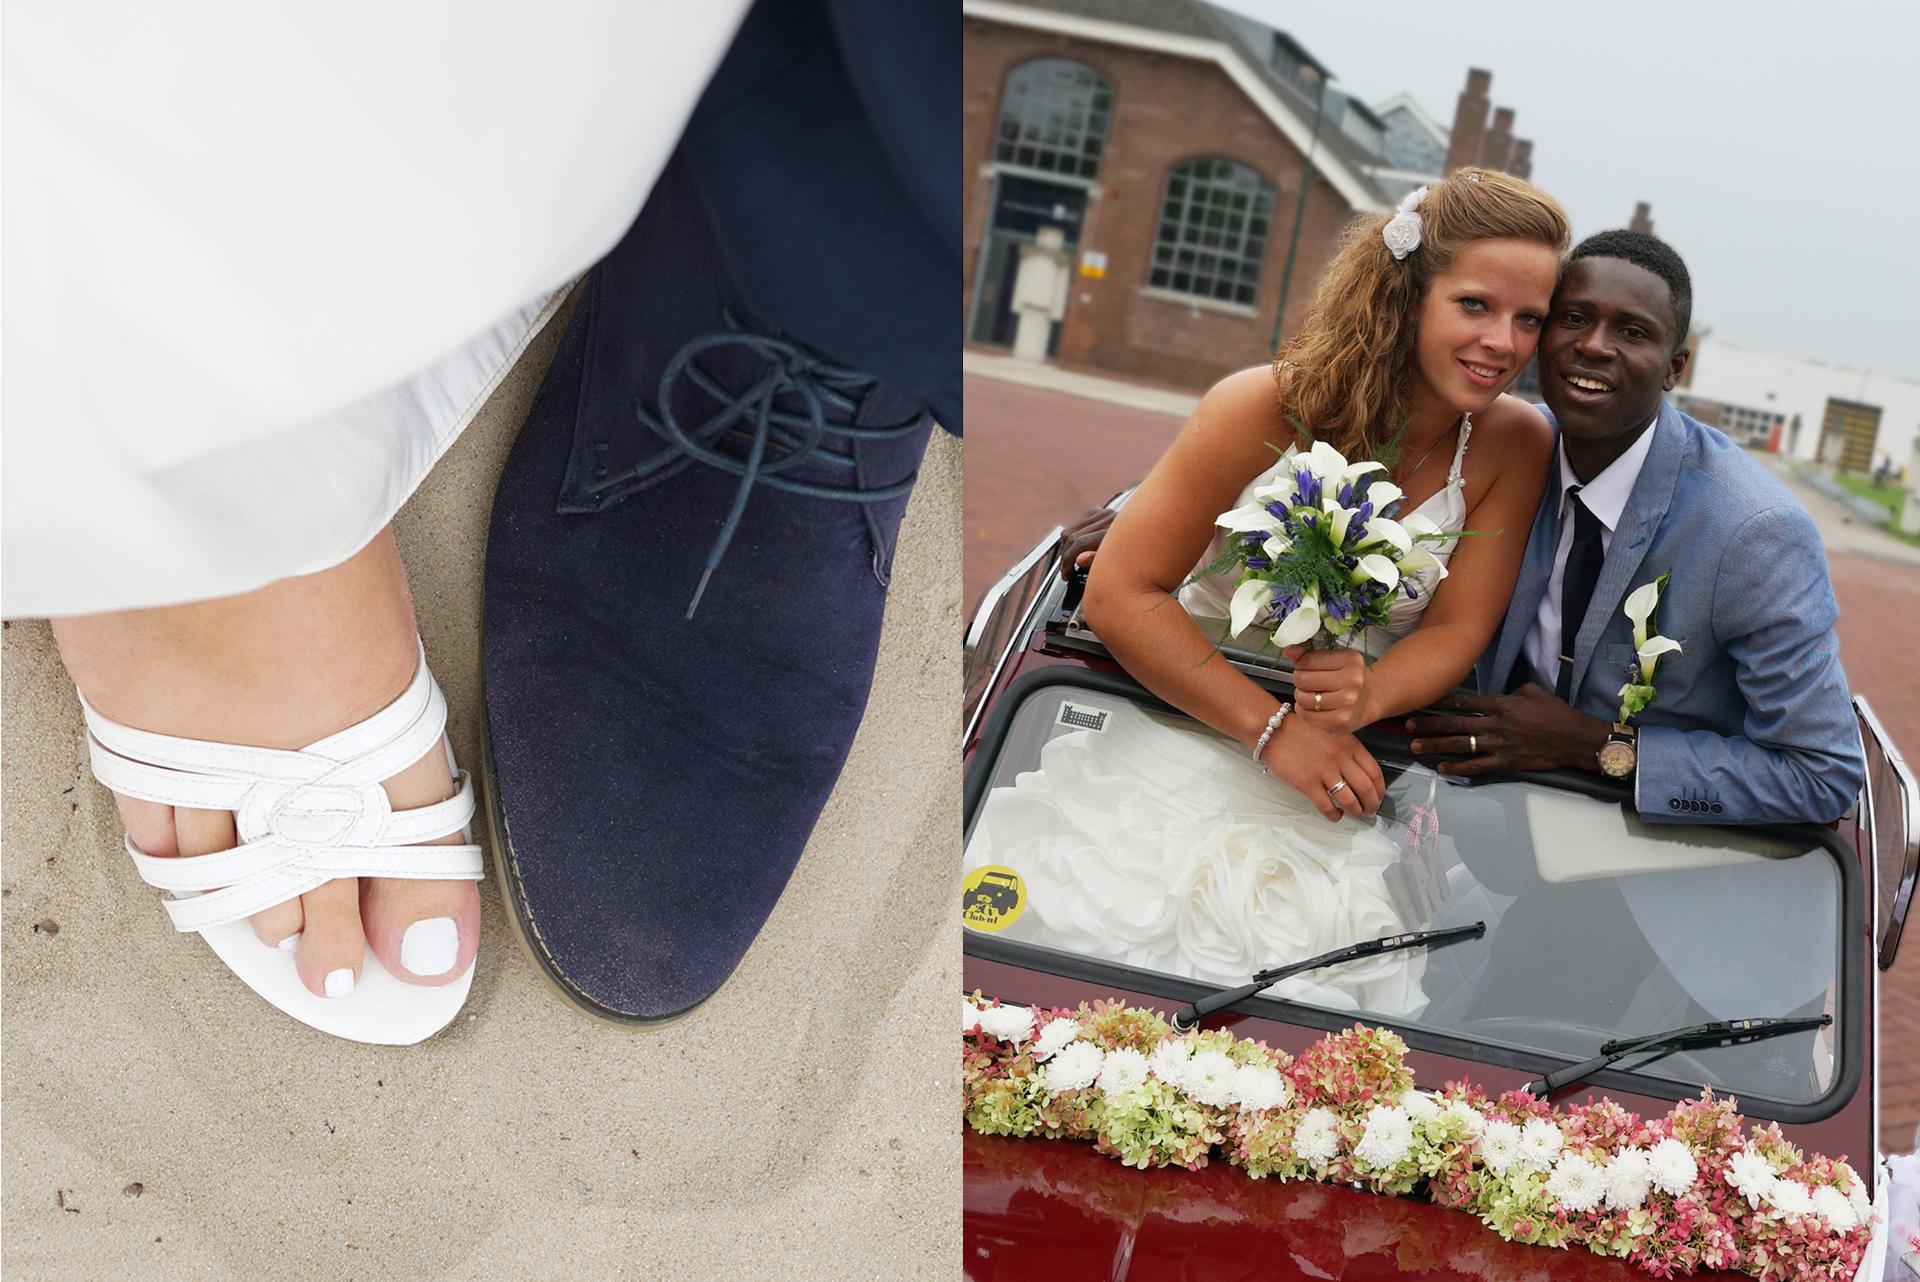 Pas getrouwd trouwen trouwdag trouwfotograaf